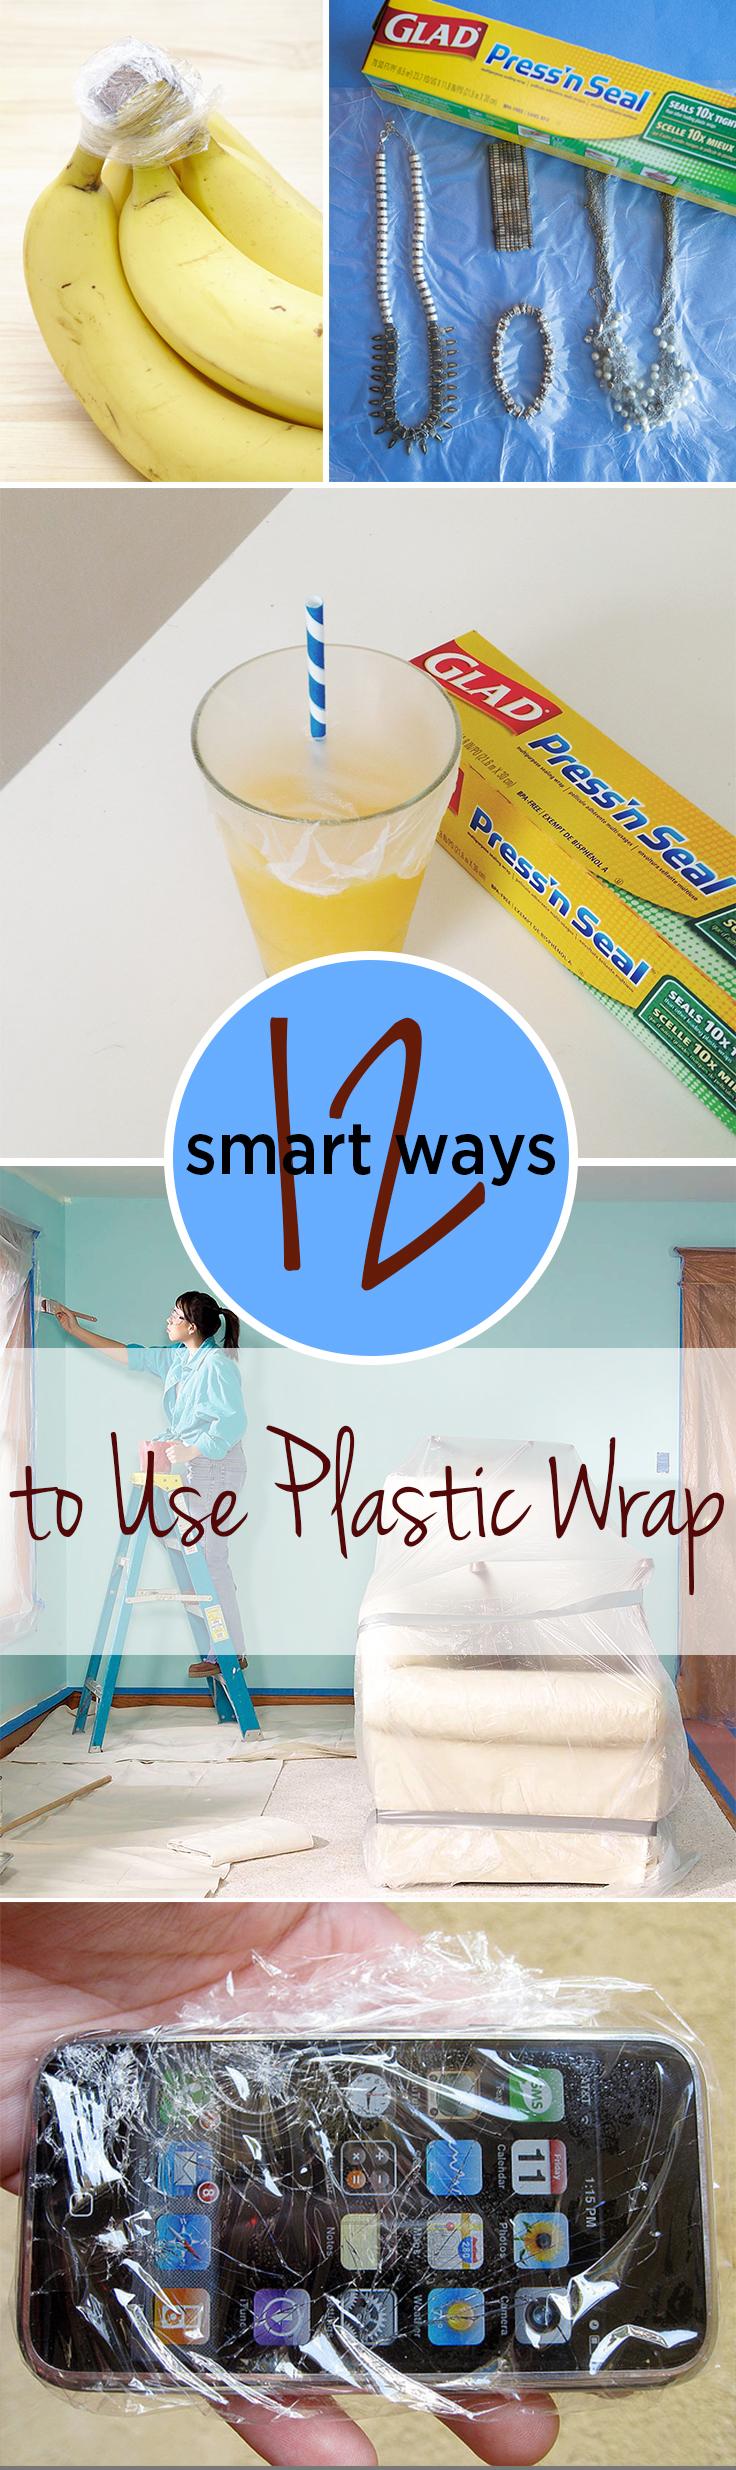 12 Smart Ways to Use Plastic Wrap